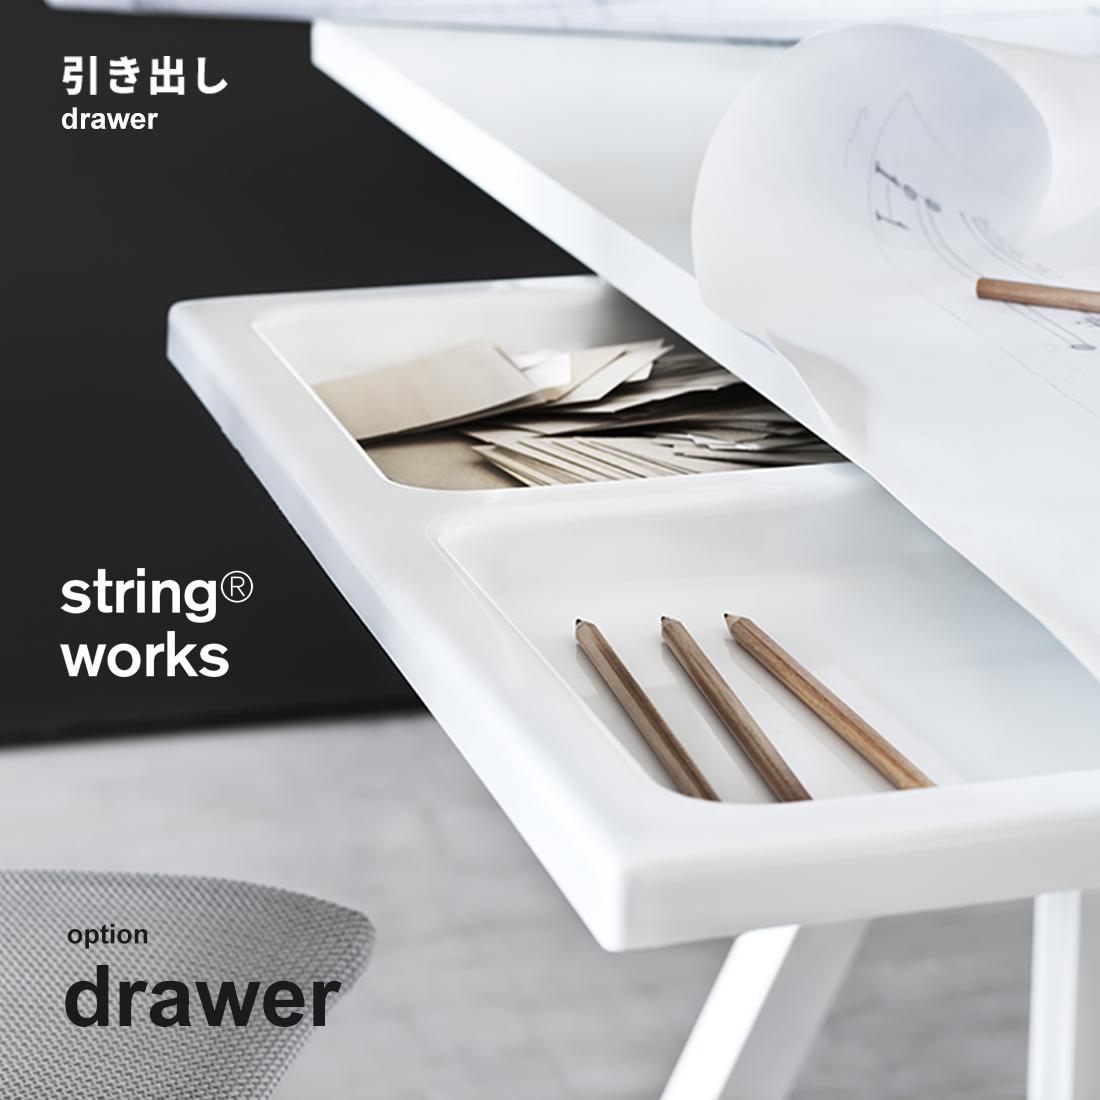 【string ストリング】string works オプション 引き出し机 テーブル 作業台 折りたたみ式 折り畳みテーブル ダイニングテーブル